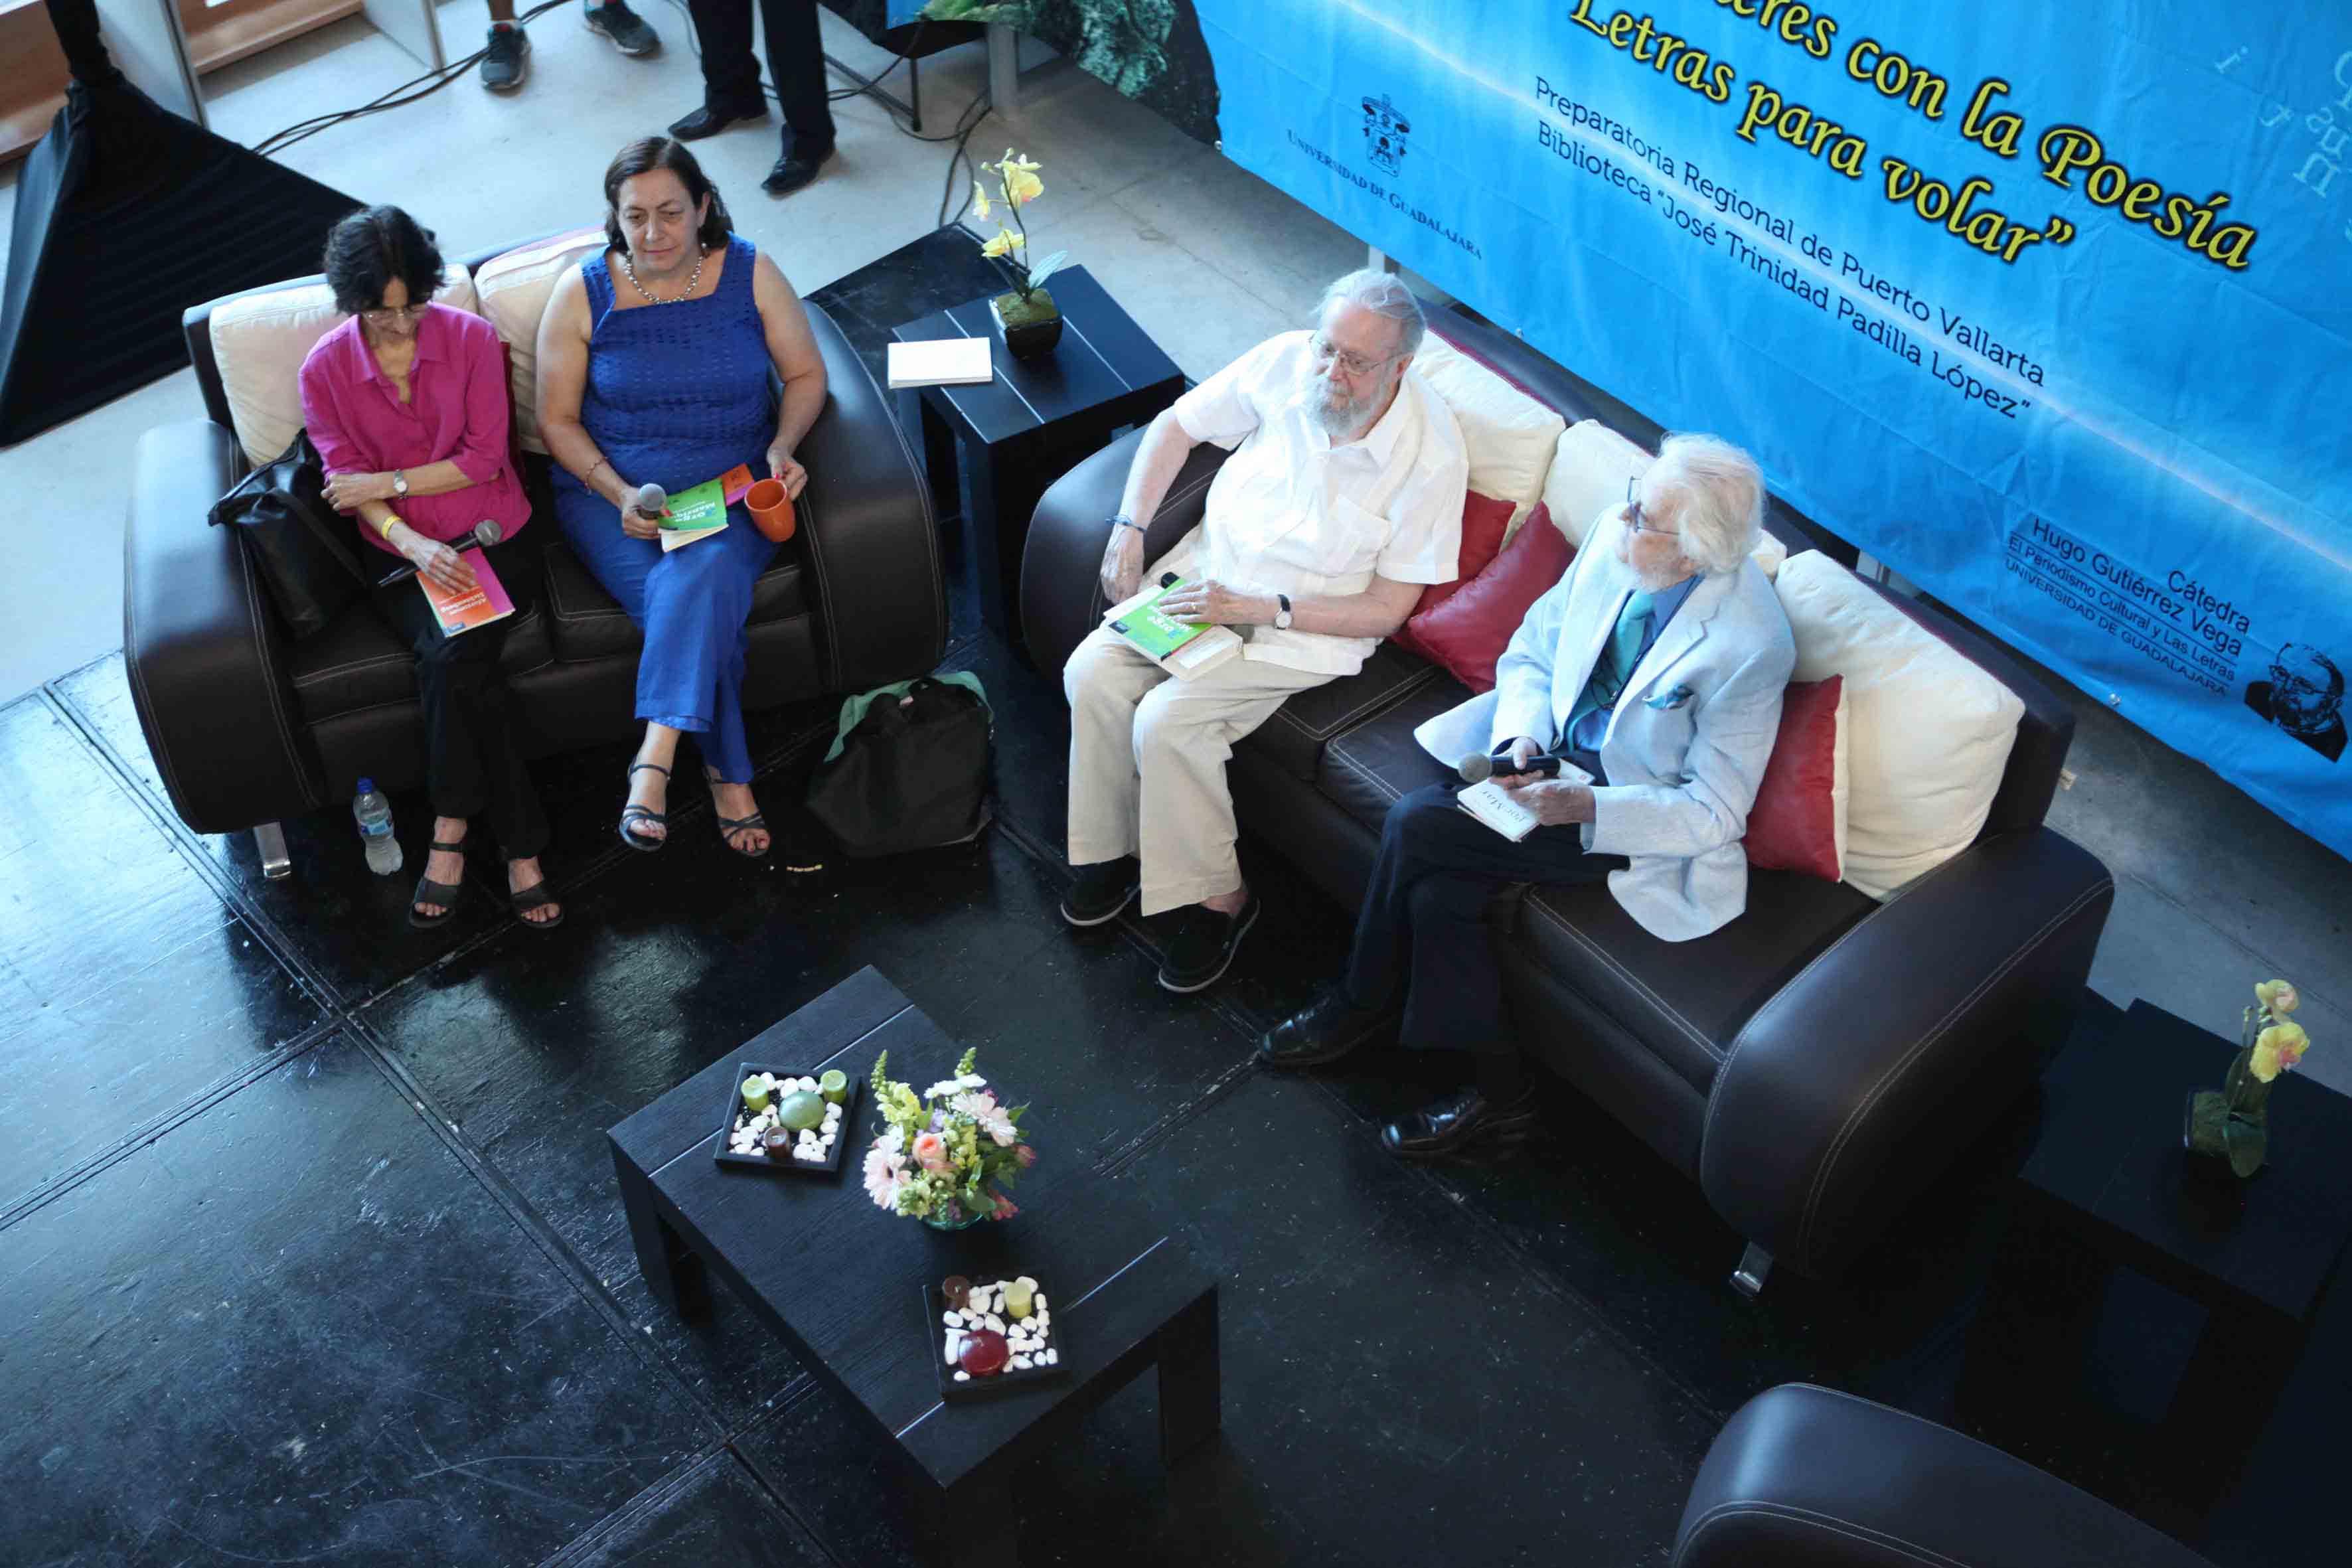 Fernando del Paso, Hugo Gutiérrez Vega, Carmen Villoro, Coral Bracho